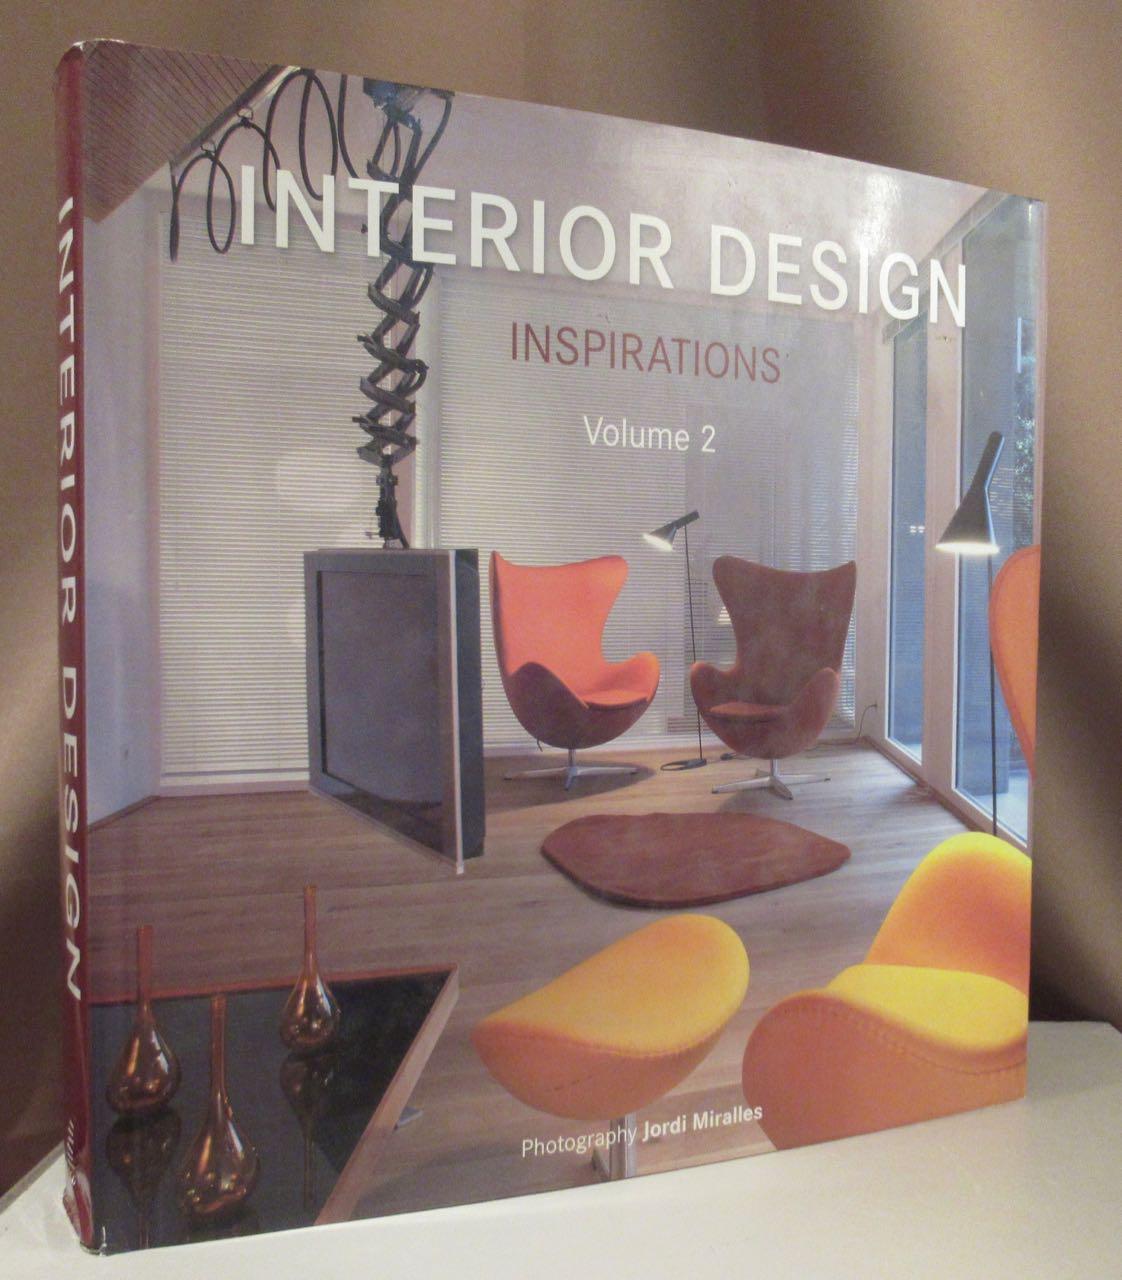 Interior Design Inspirations. Volume 2. Photography Jordi Miralles.